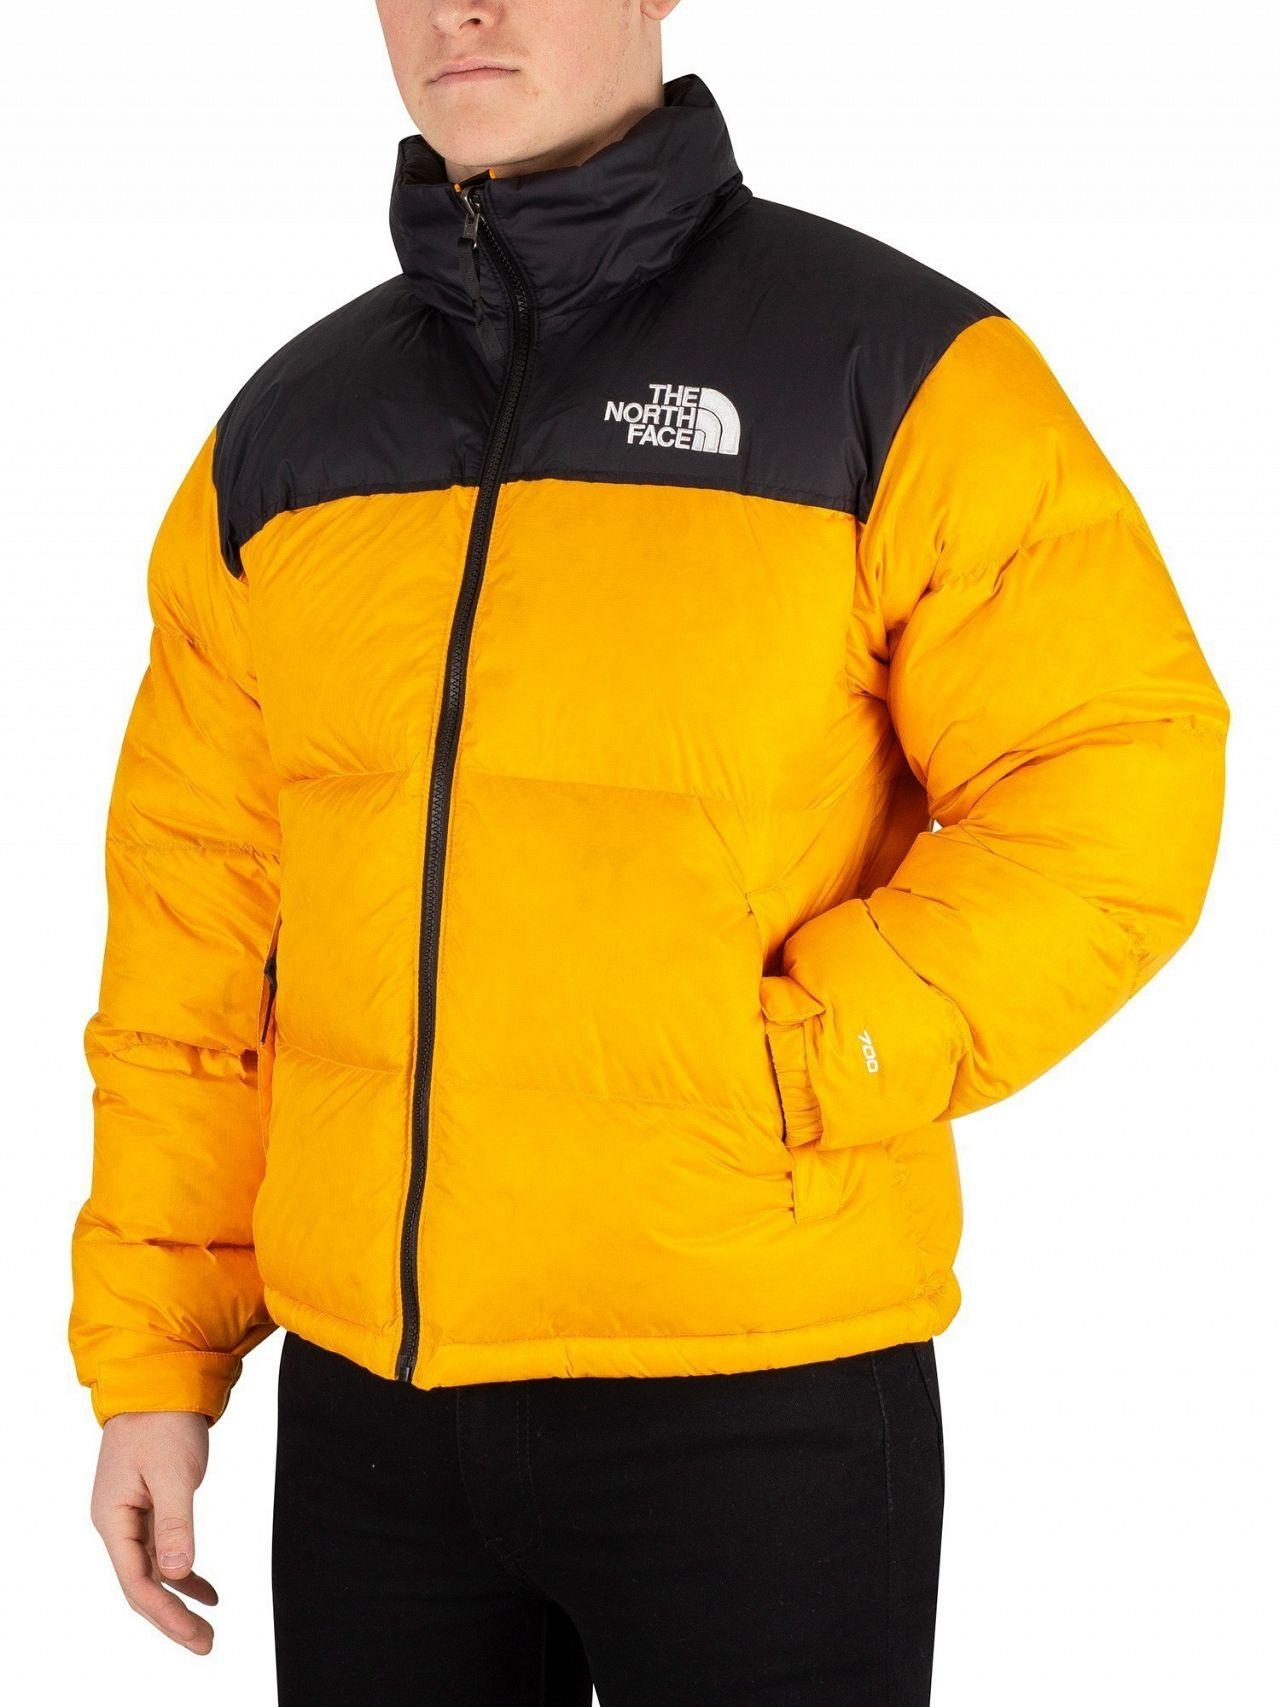 e9dea43bd The North Face Zinnia Orange 1996 Retro Nuptse Jacket